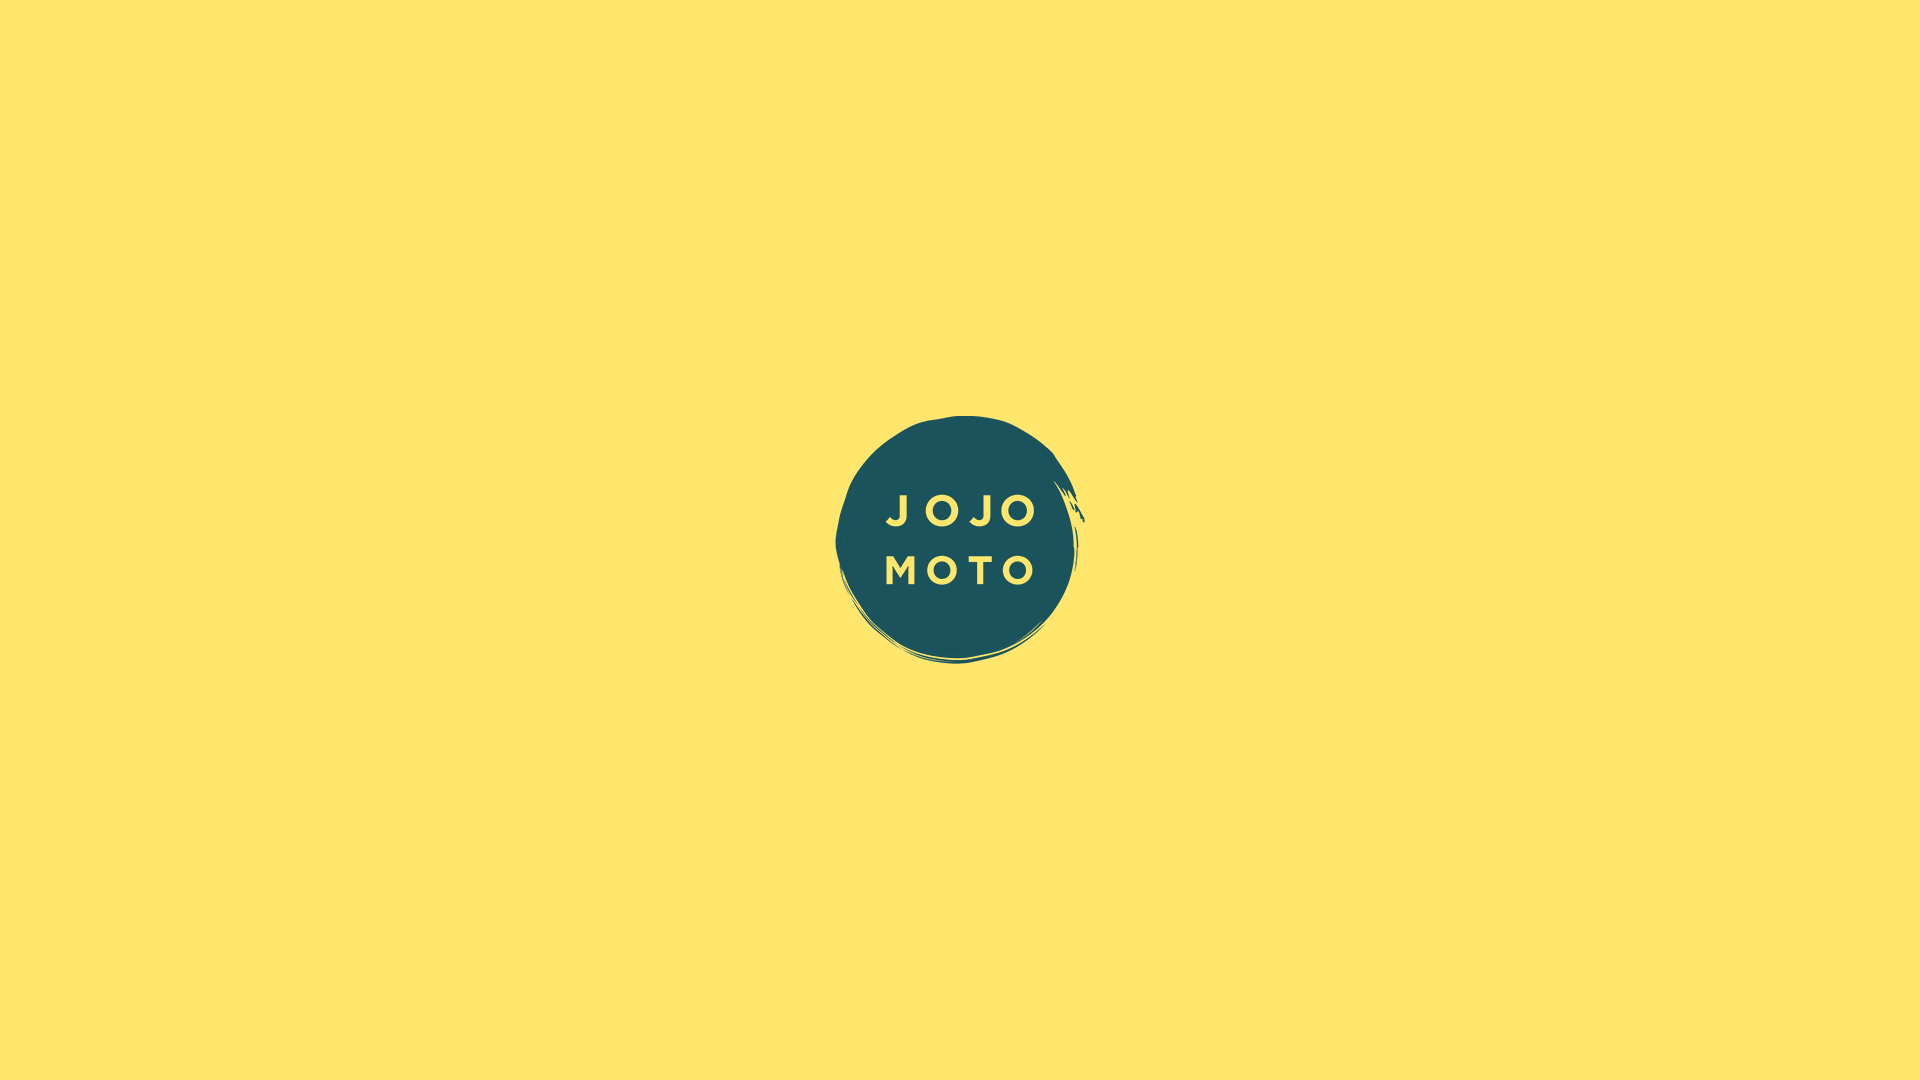 Jojomoto Showreel